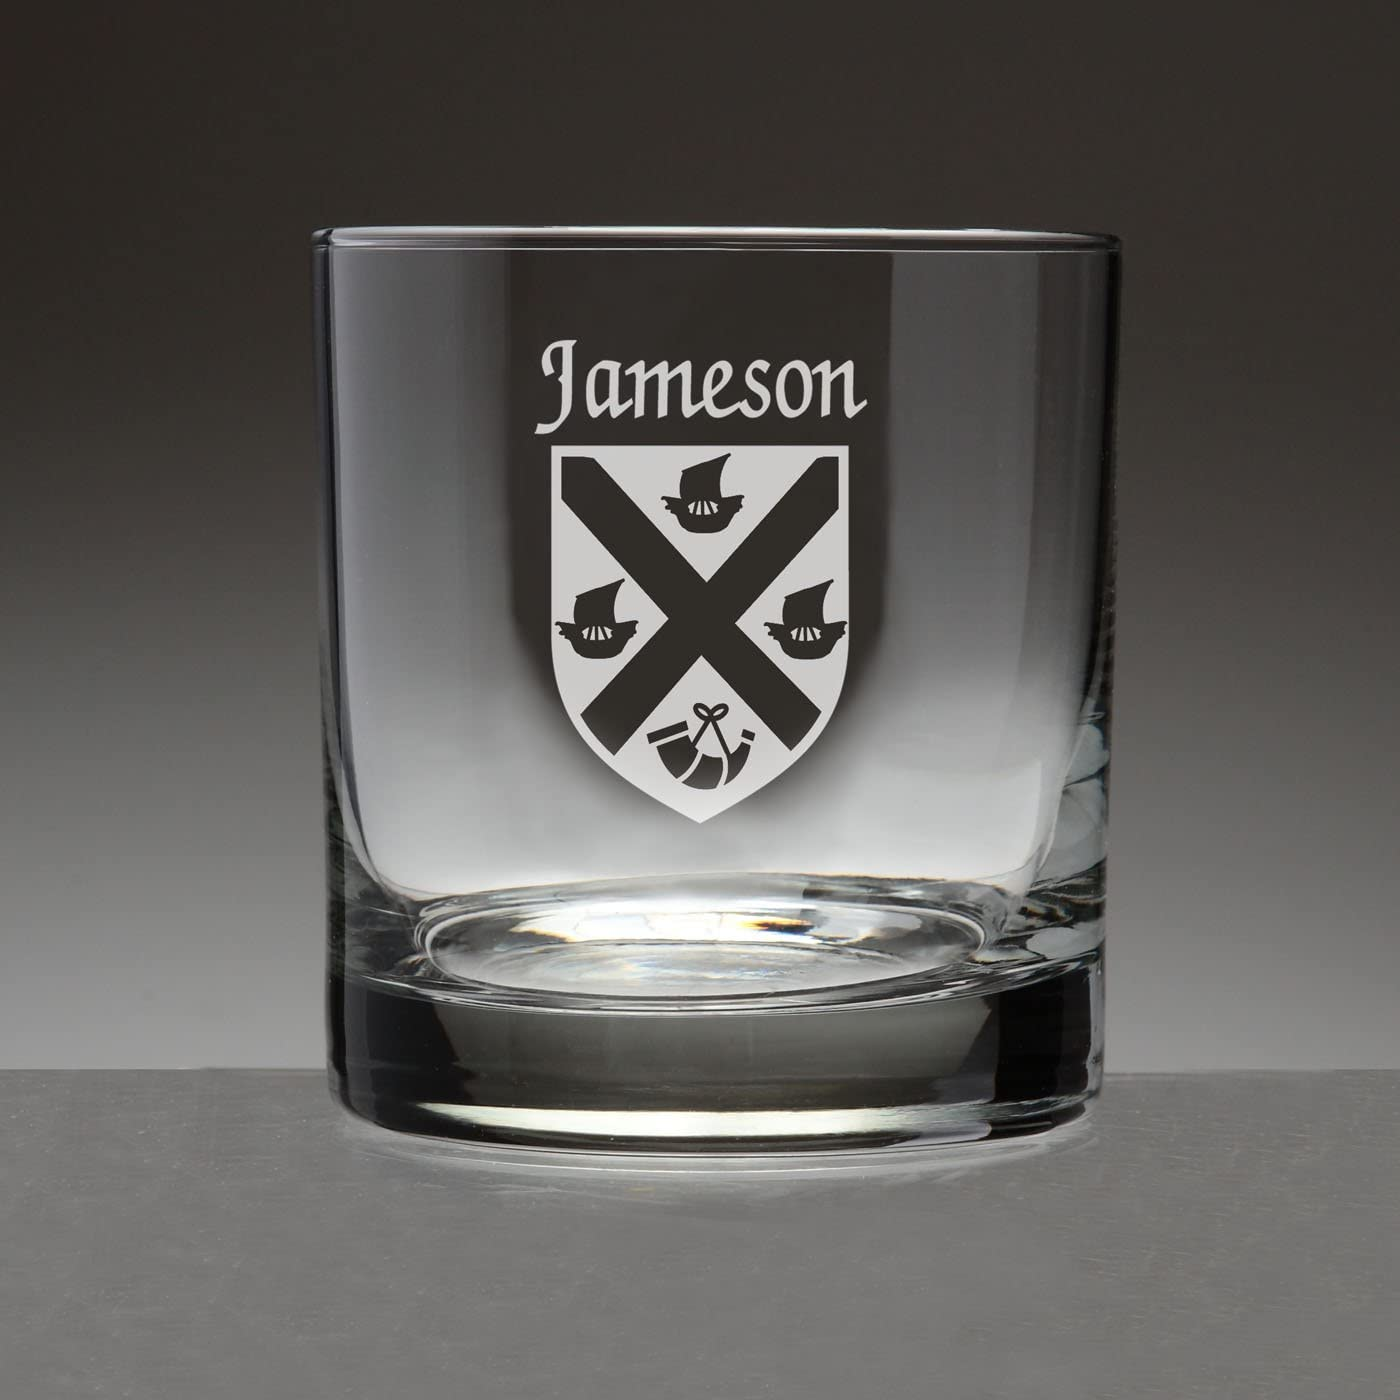 set of 2 Jameson Irish Whiskey rocks glasses